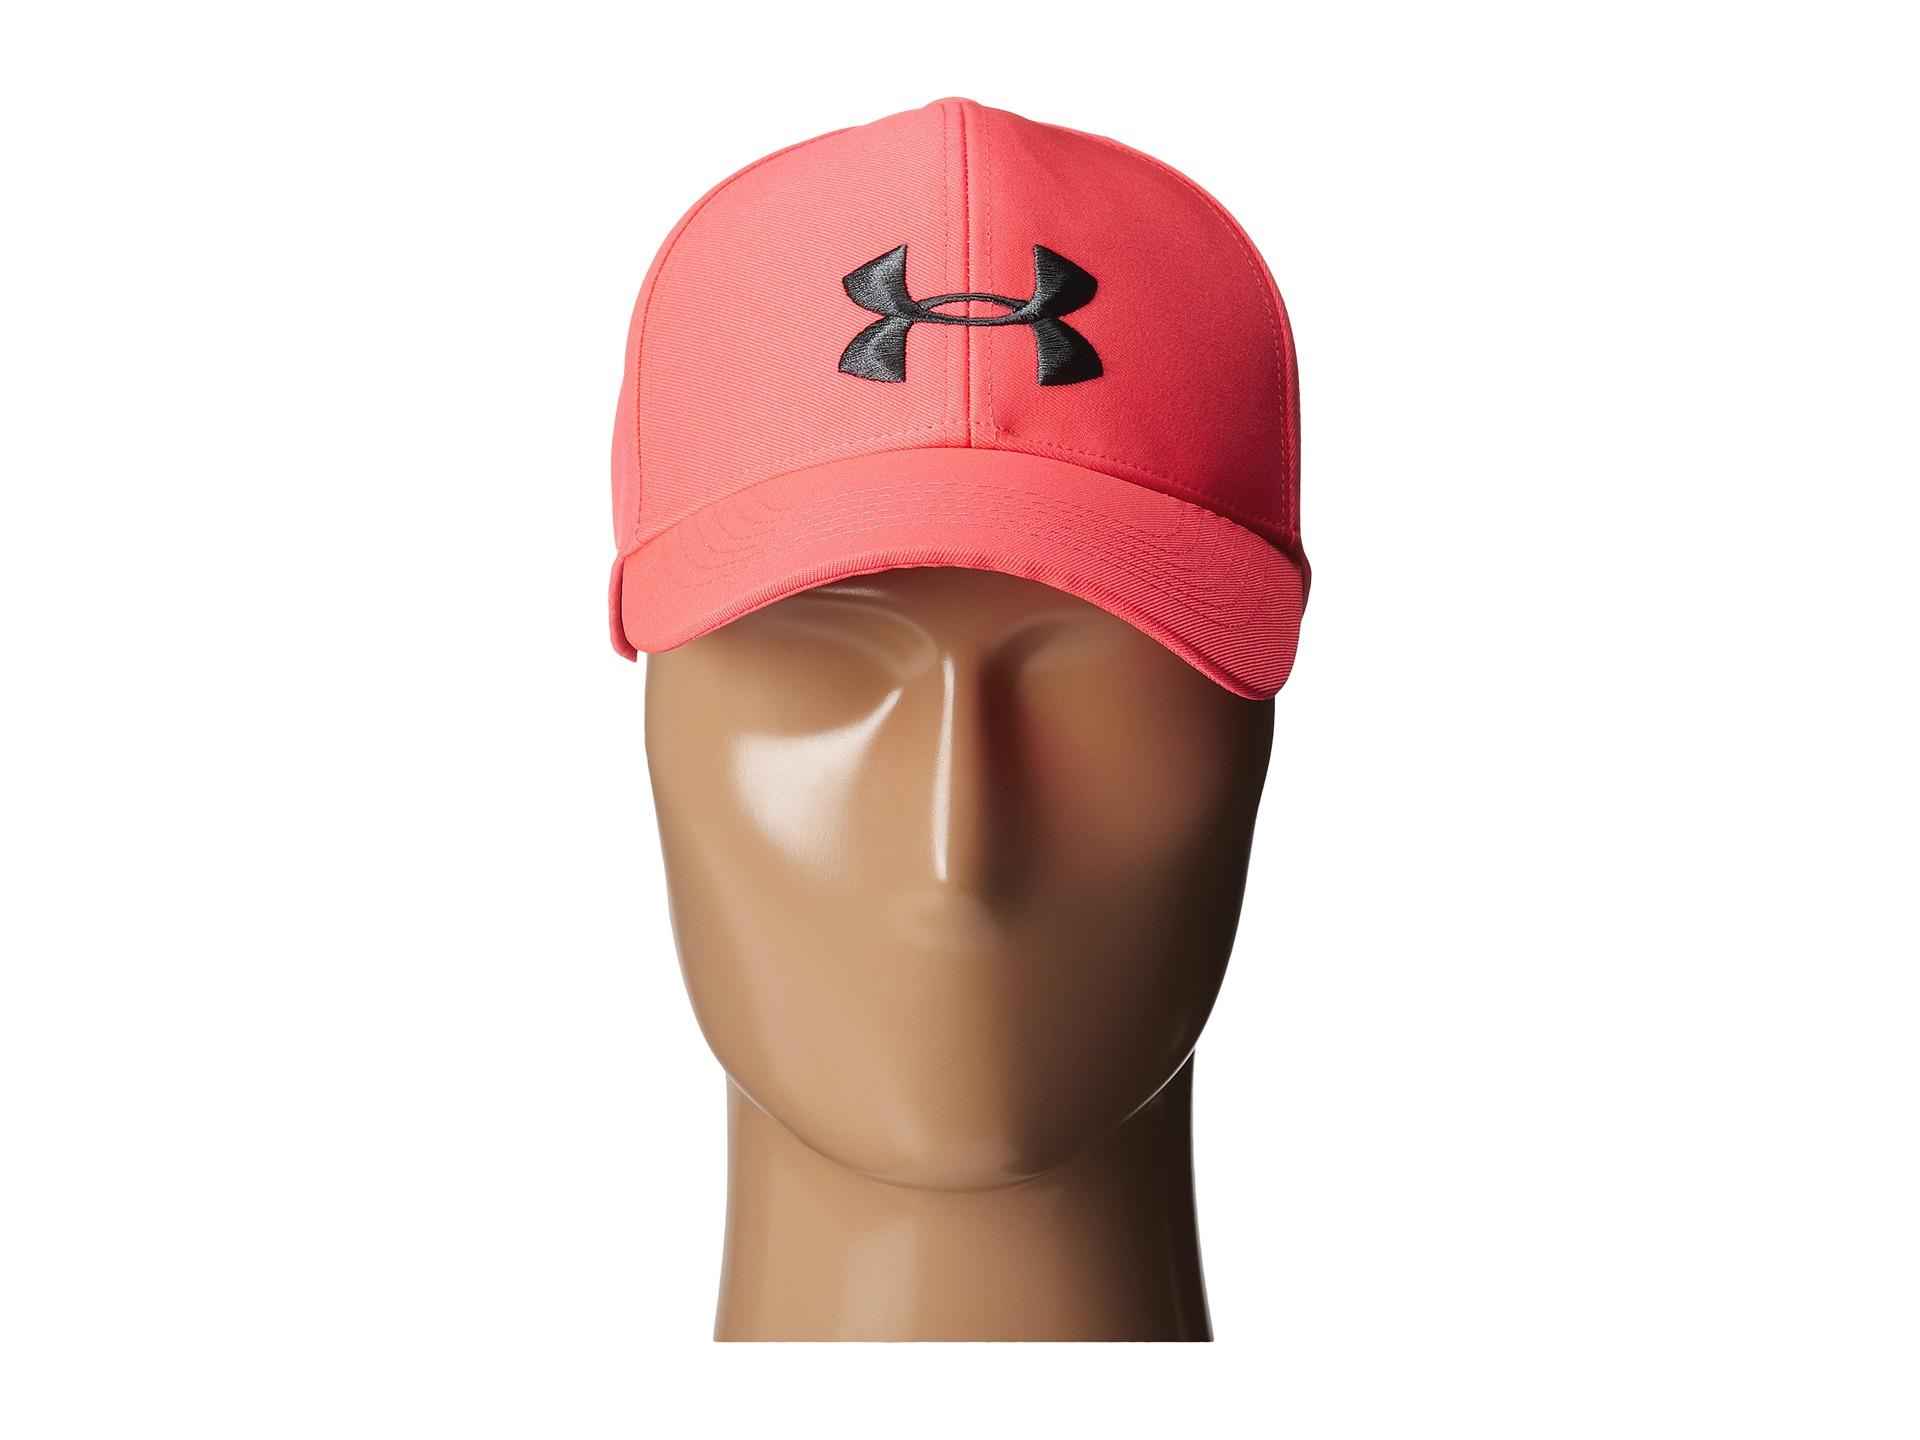 Lyst - Under Armour Ua Big Logo Adjustable Cap in Pink 094e99f3d9e